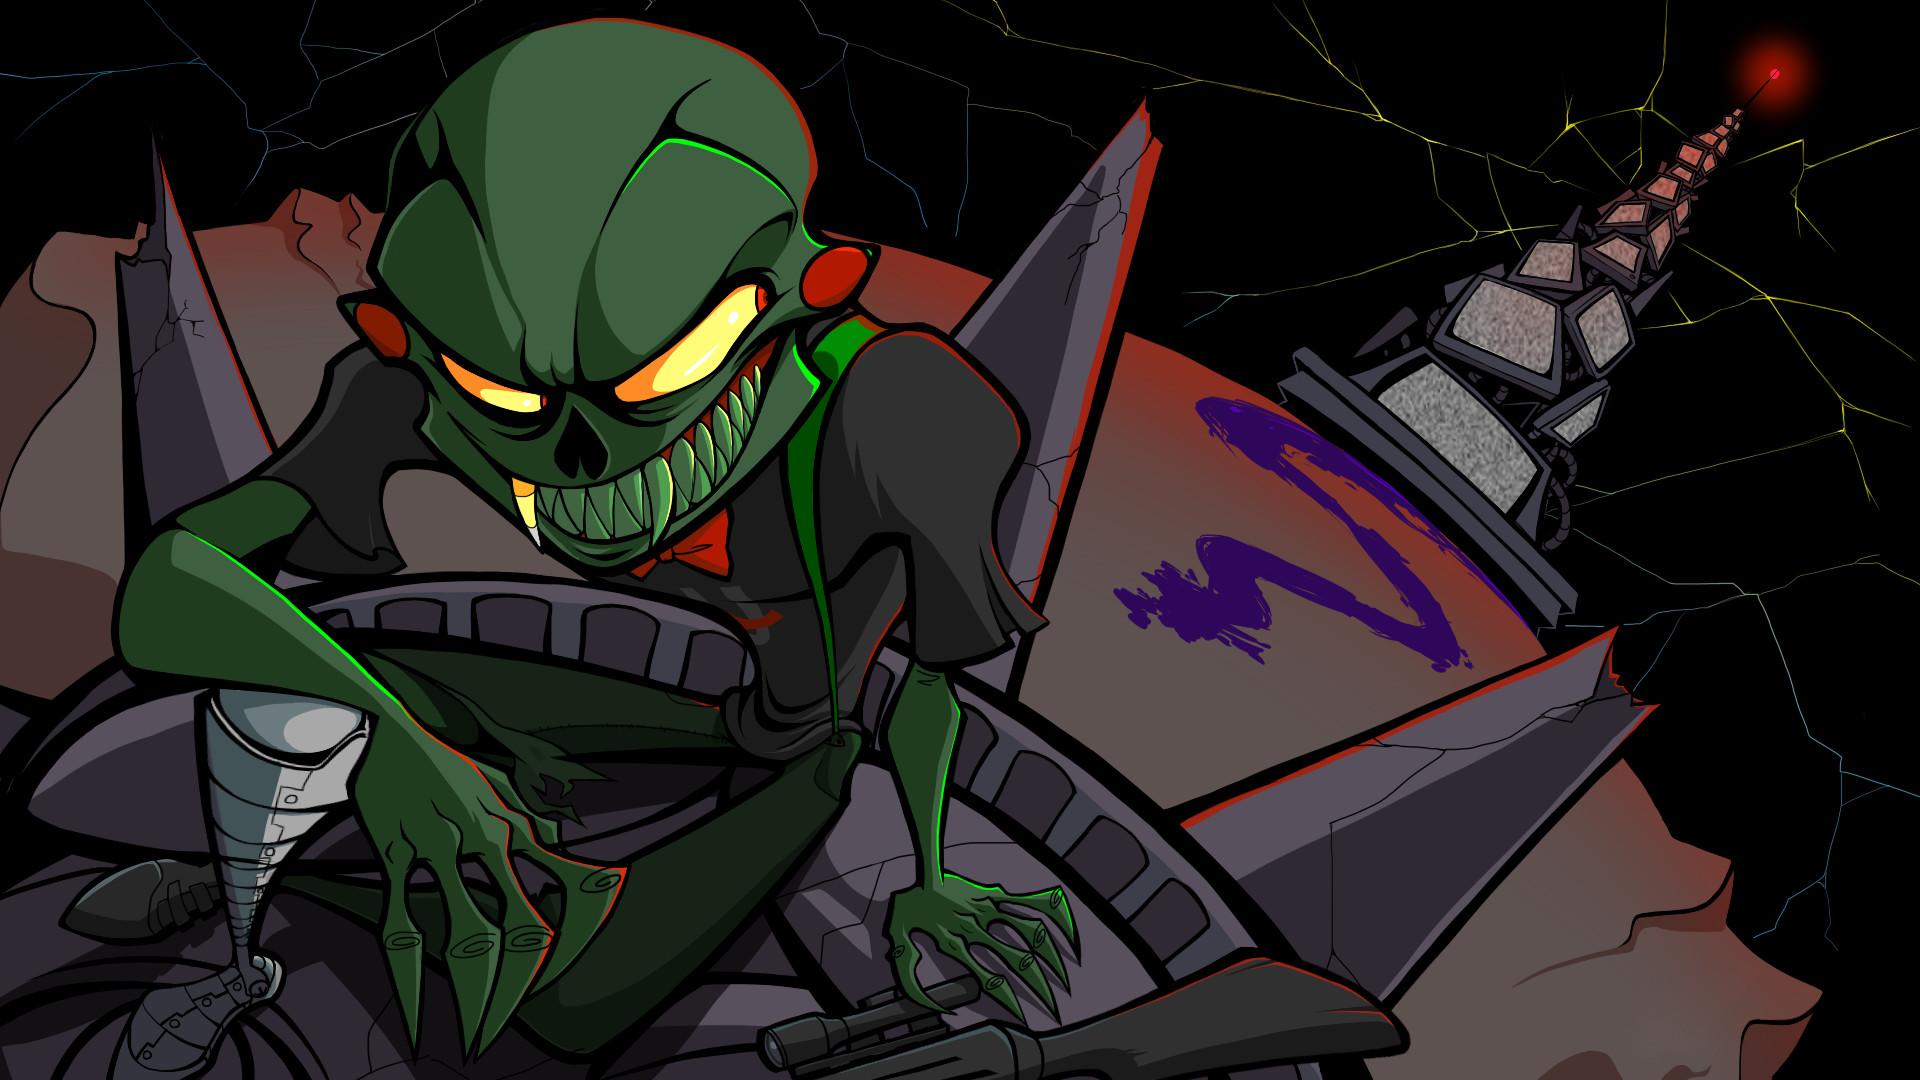 … Homestuck sci-fi alien wallpaper …